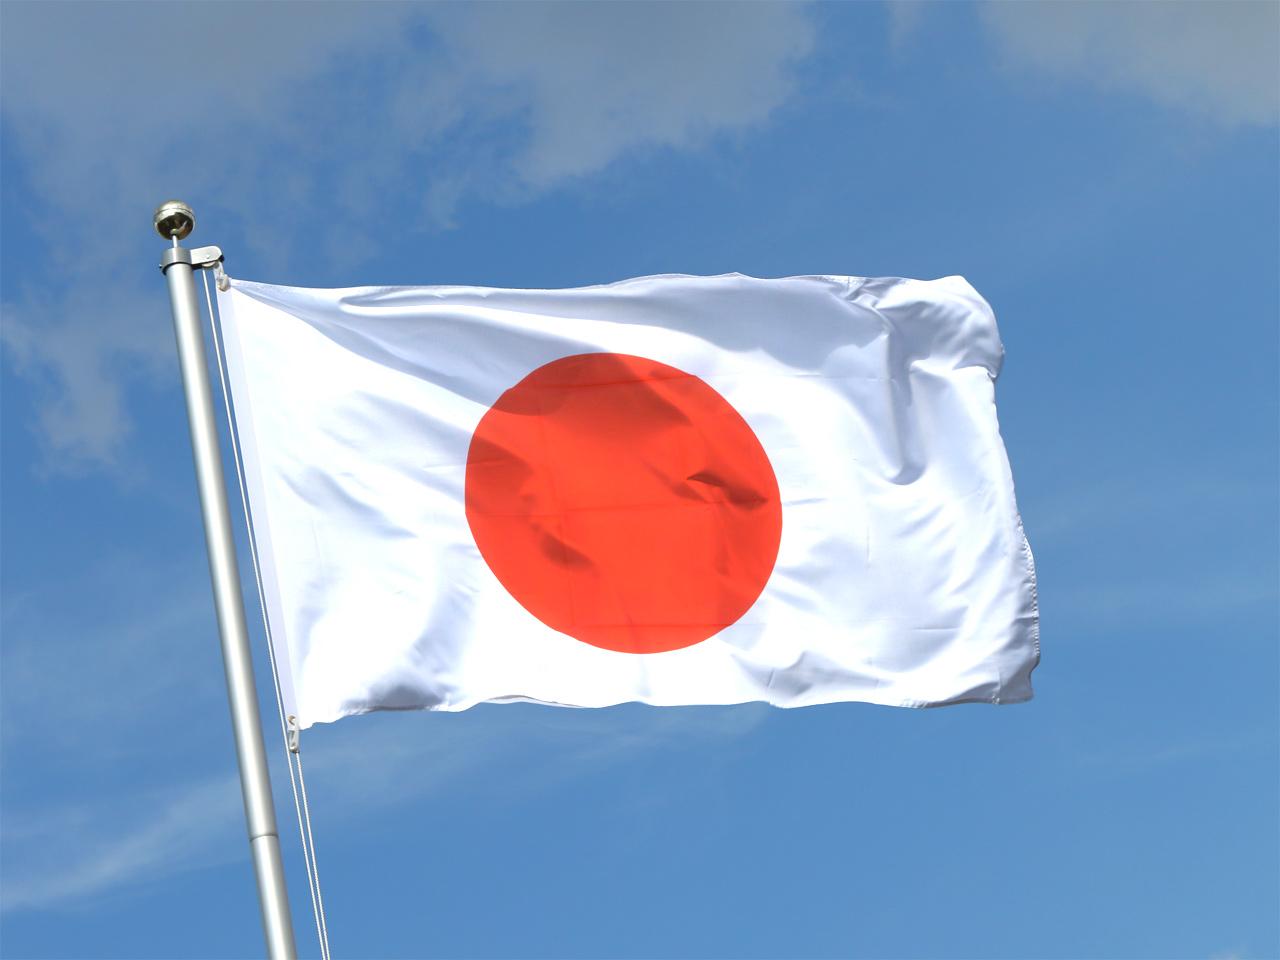 Japan Kriegsflagge Hissflagge japanische Fahnen Flaggen 150x250cm